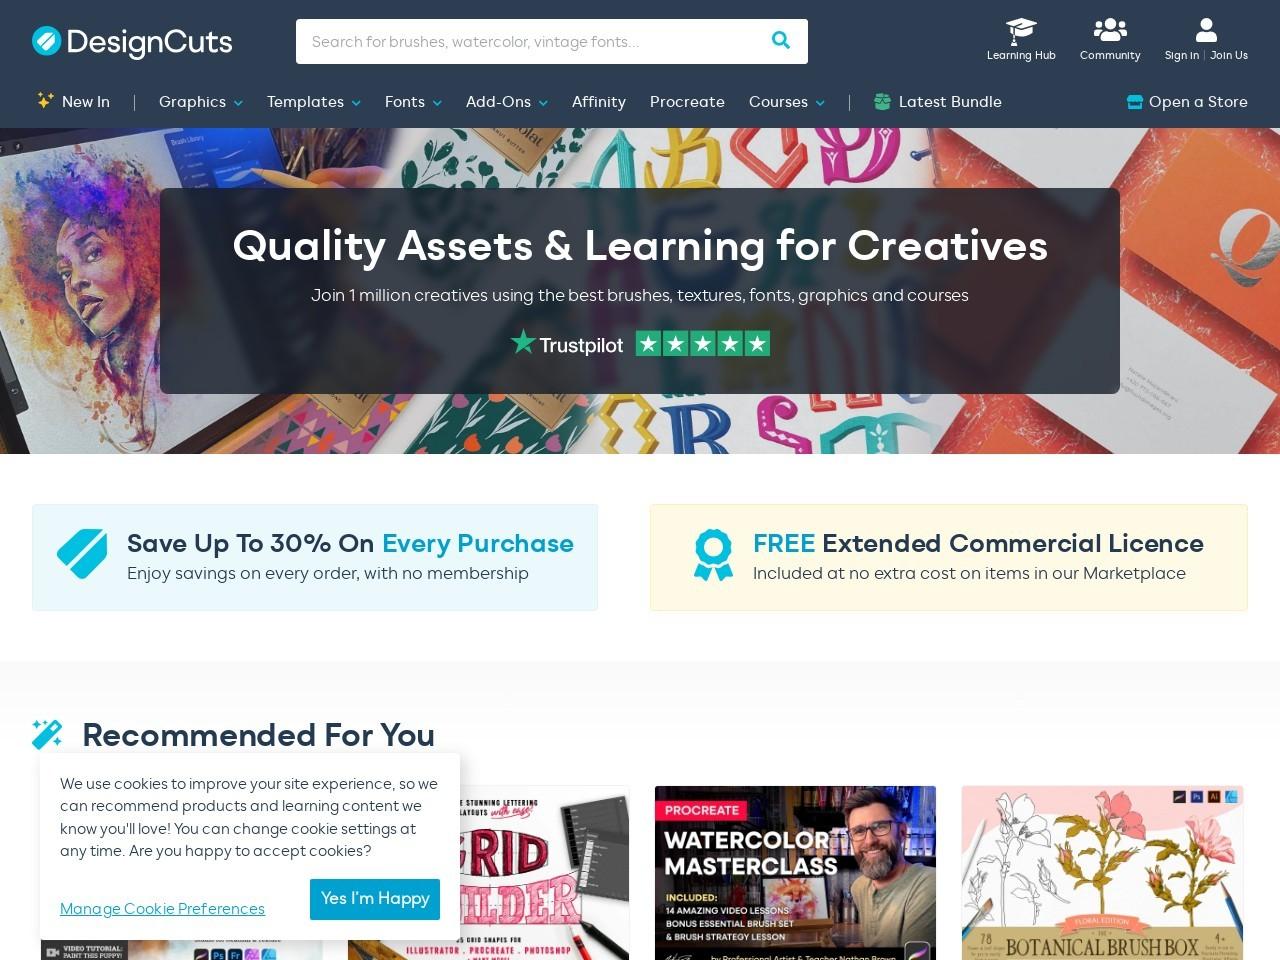 http://www.designcuts.com